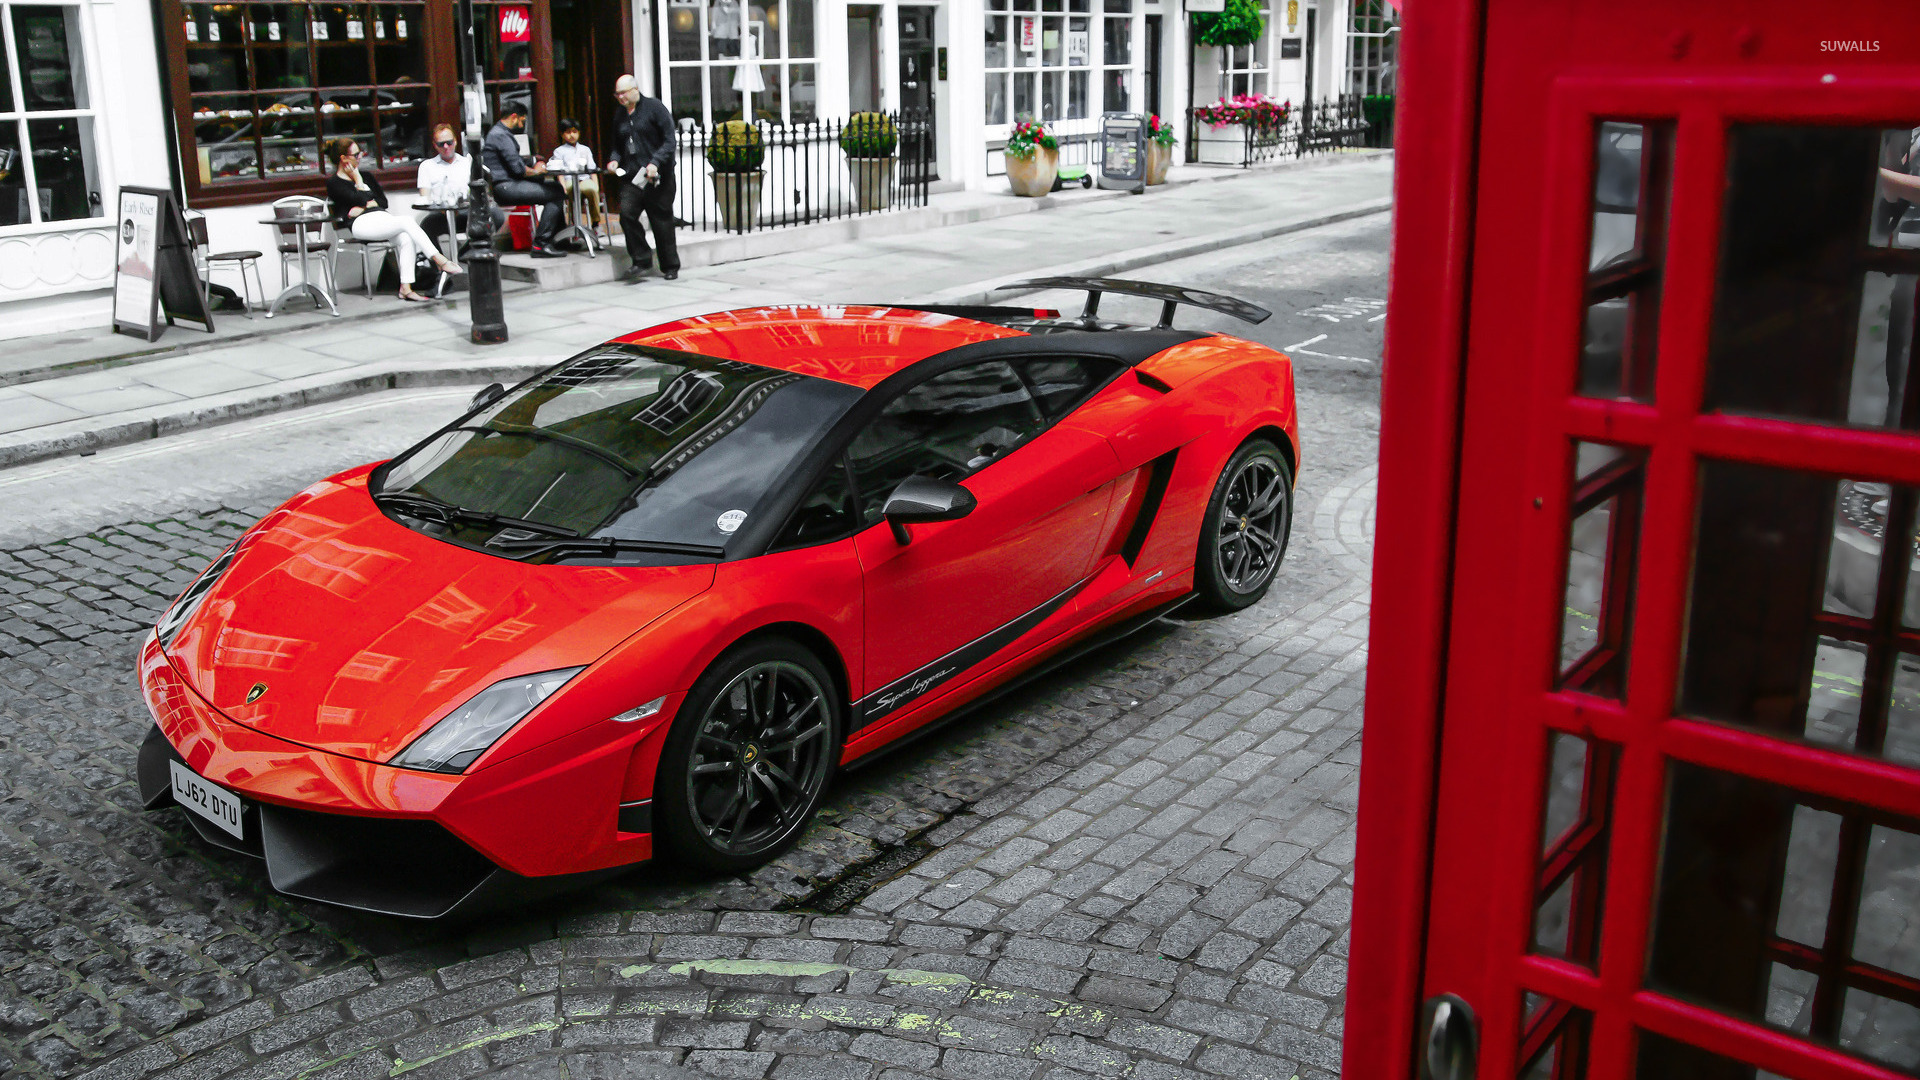 4k Wallpapers Exotic Super Sports Cars Red Lamborghini Gallardo Superleggera Top View Wallpaper